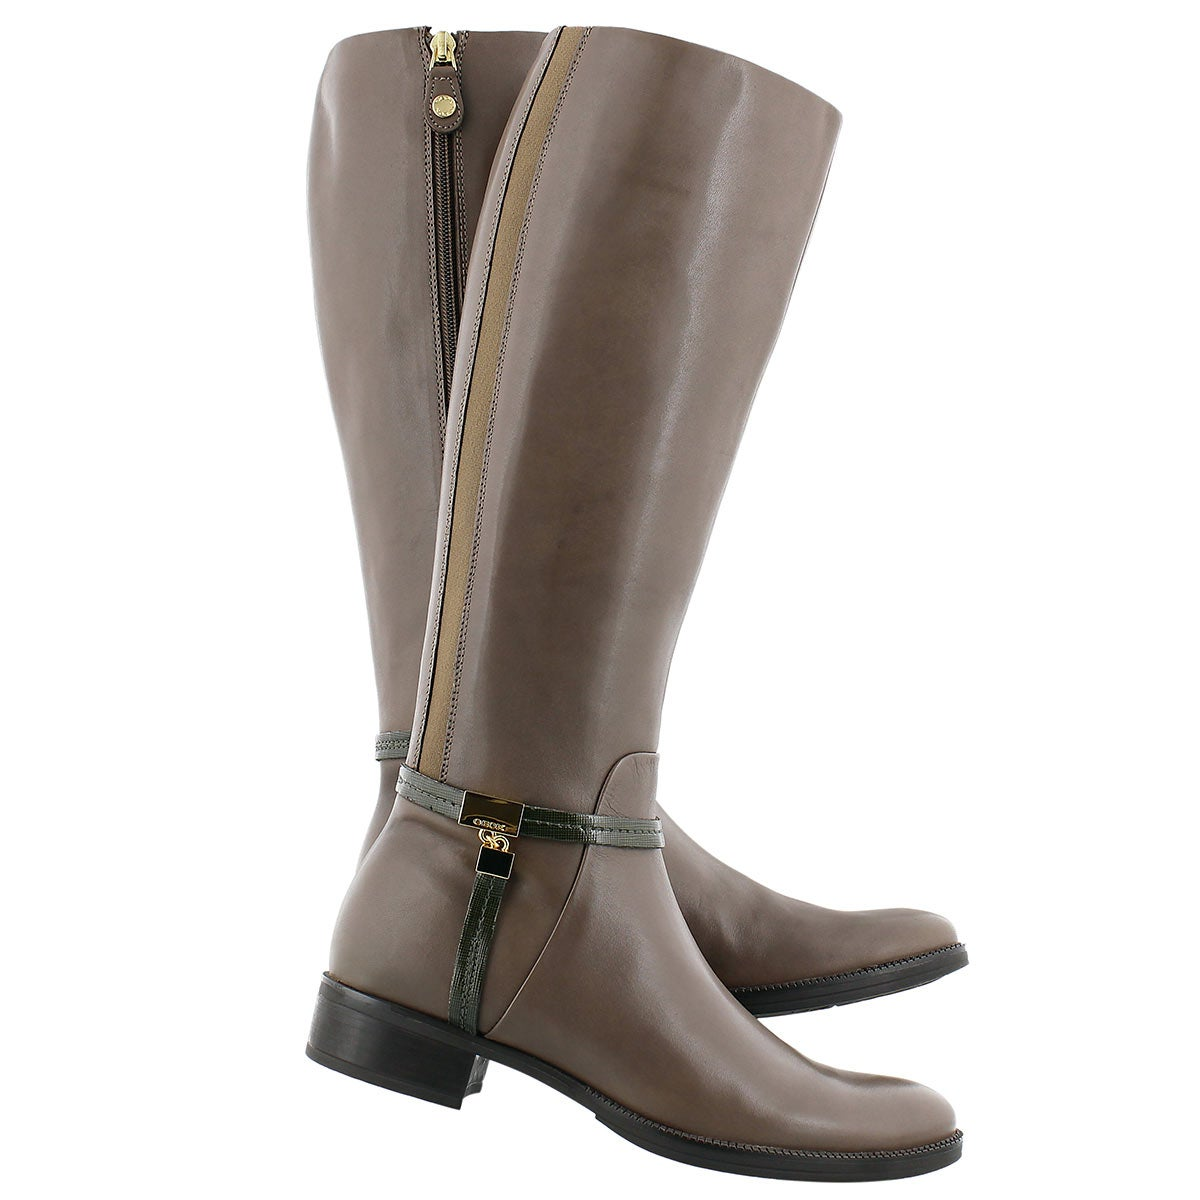 Lds Mendi Stivali B gry/olv riding boot